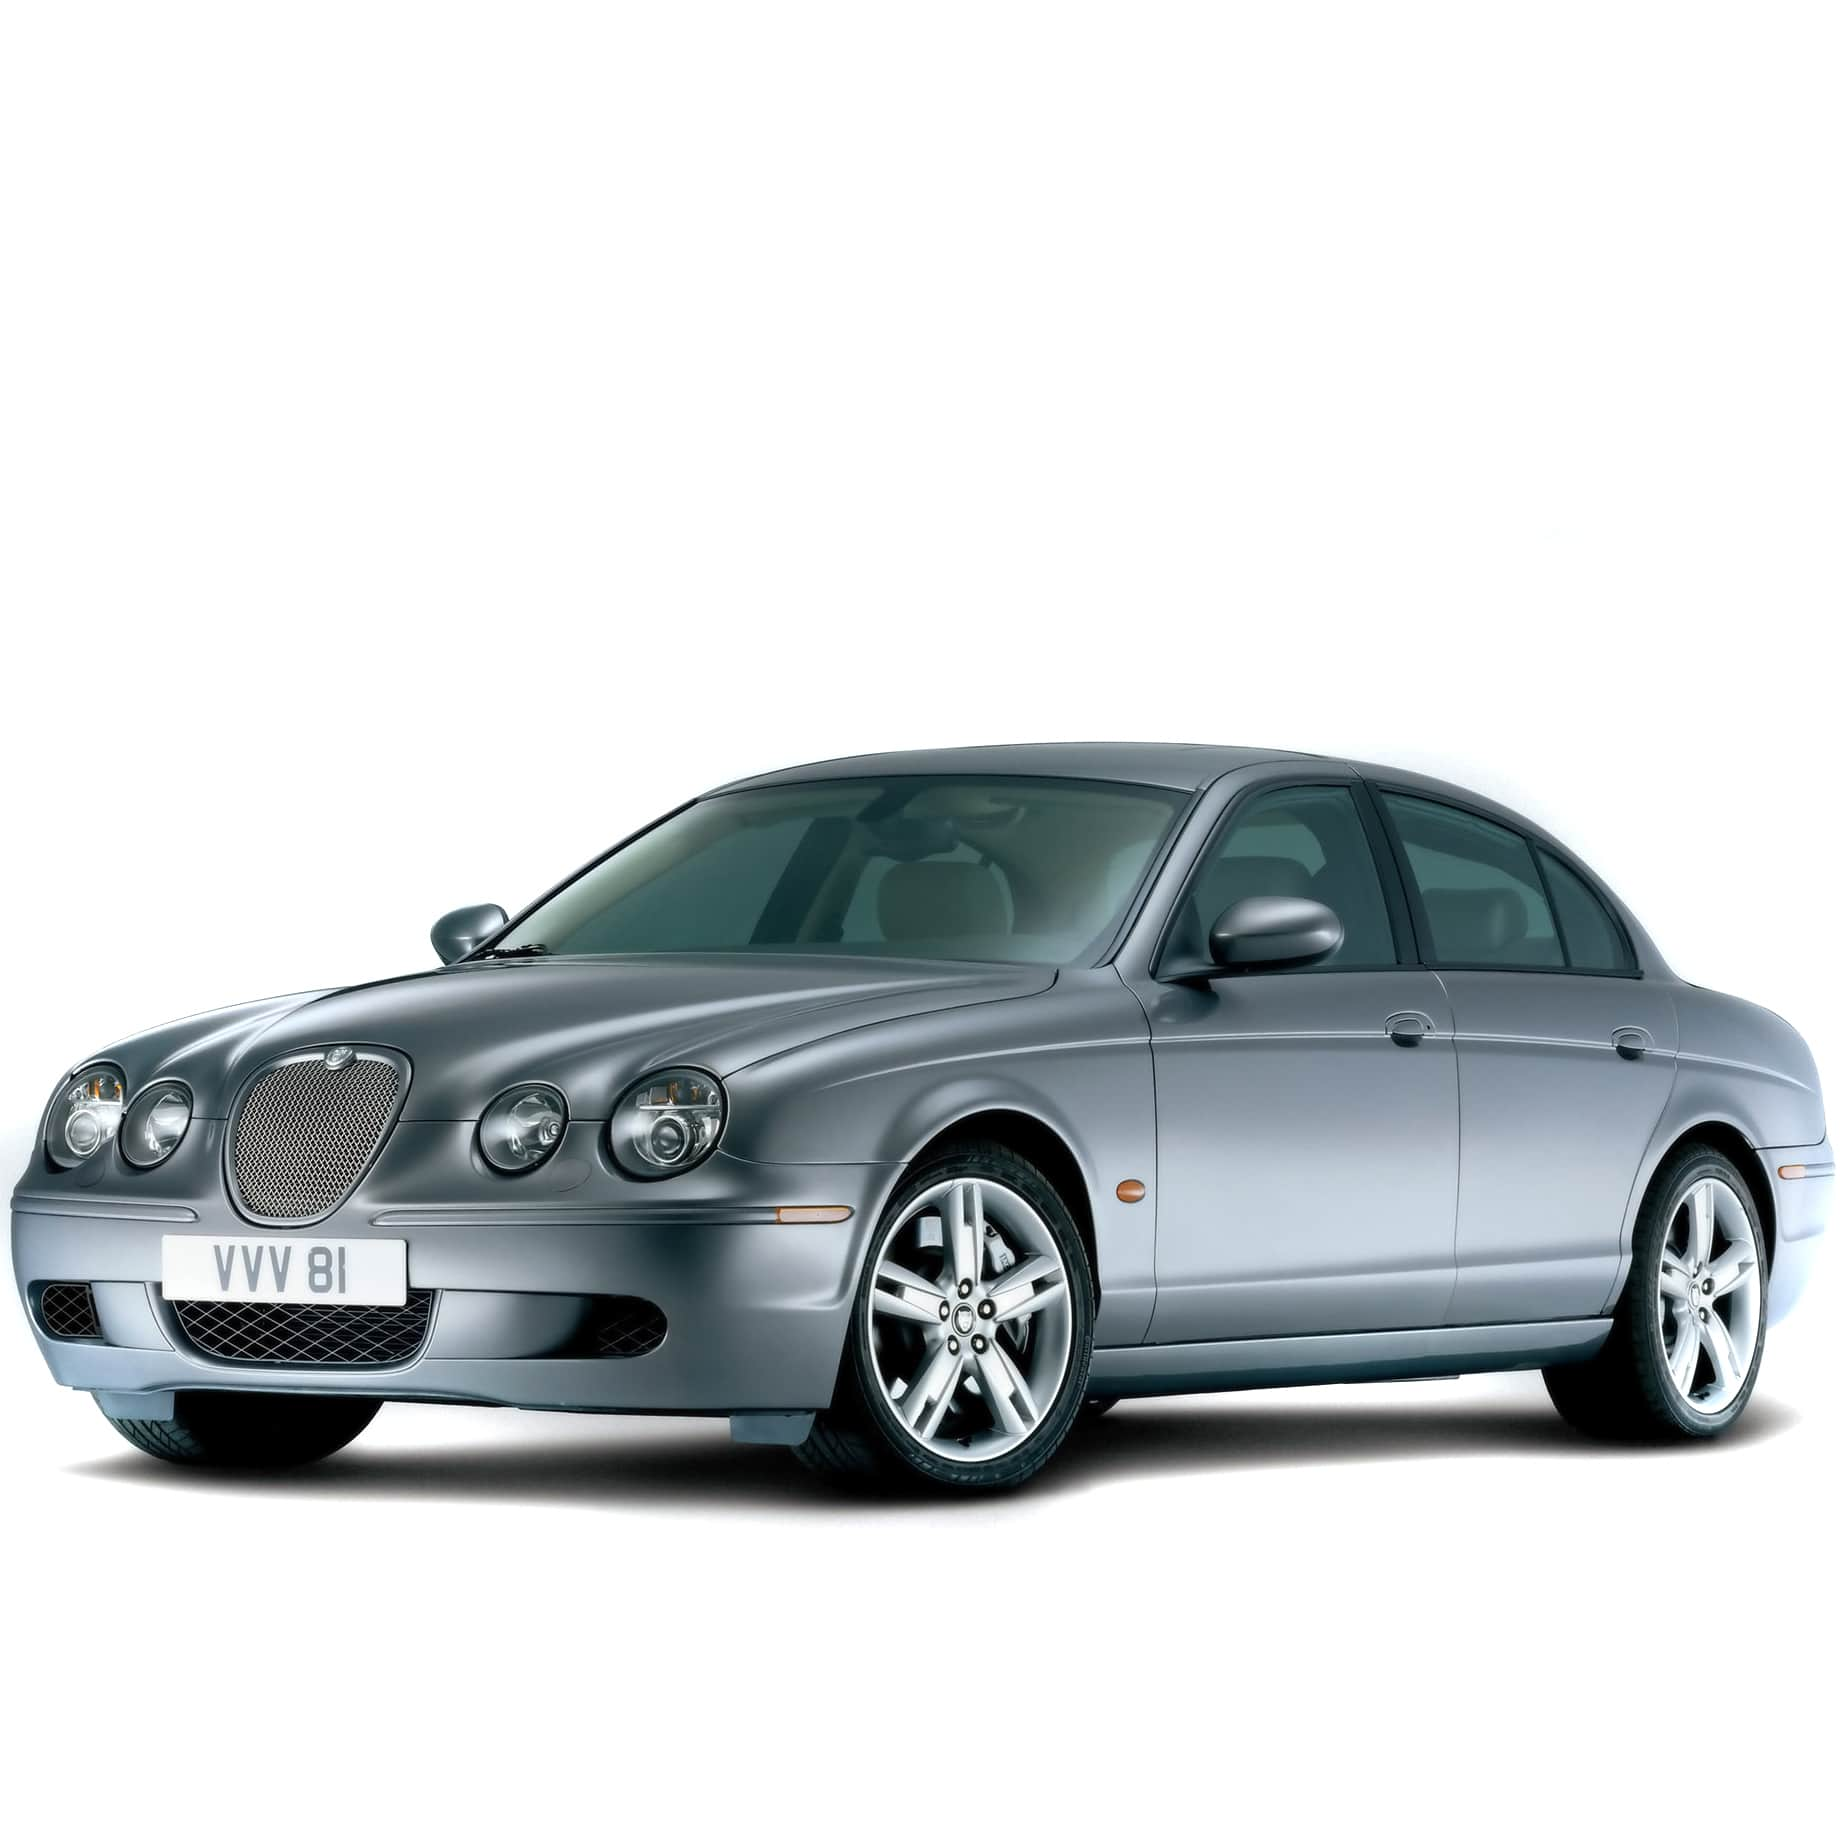 Floor mats jaguar s type - Jaguar S Type Car Mats